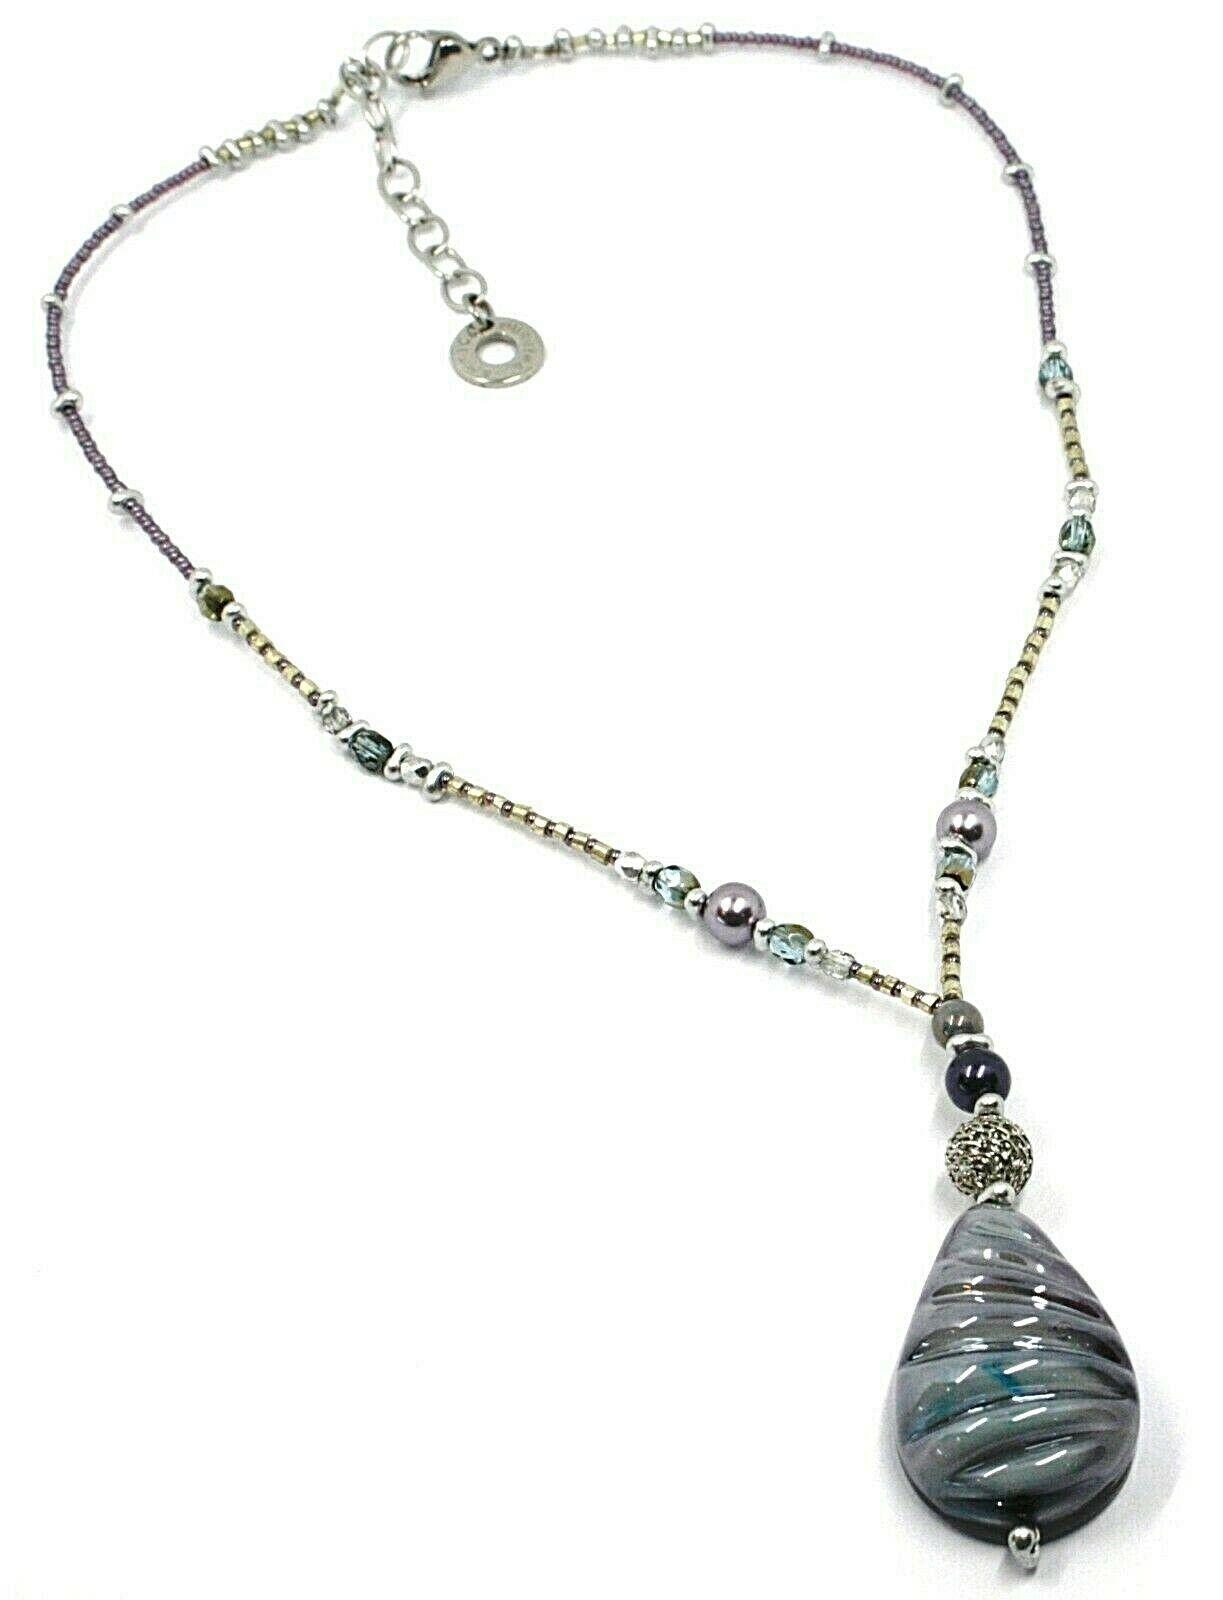 Halskette Antica Murrina Venezia, CO860A05, Tropf Anhänger, Violet Blau